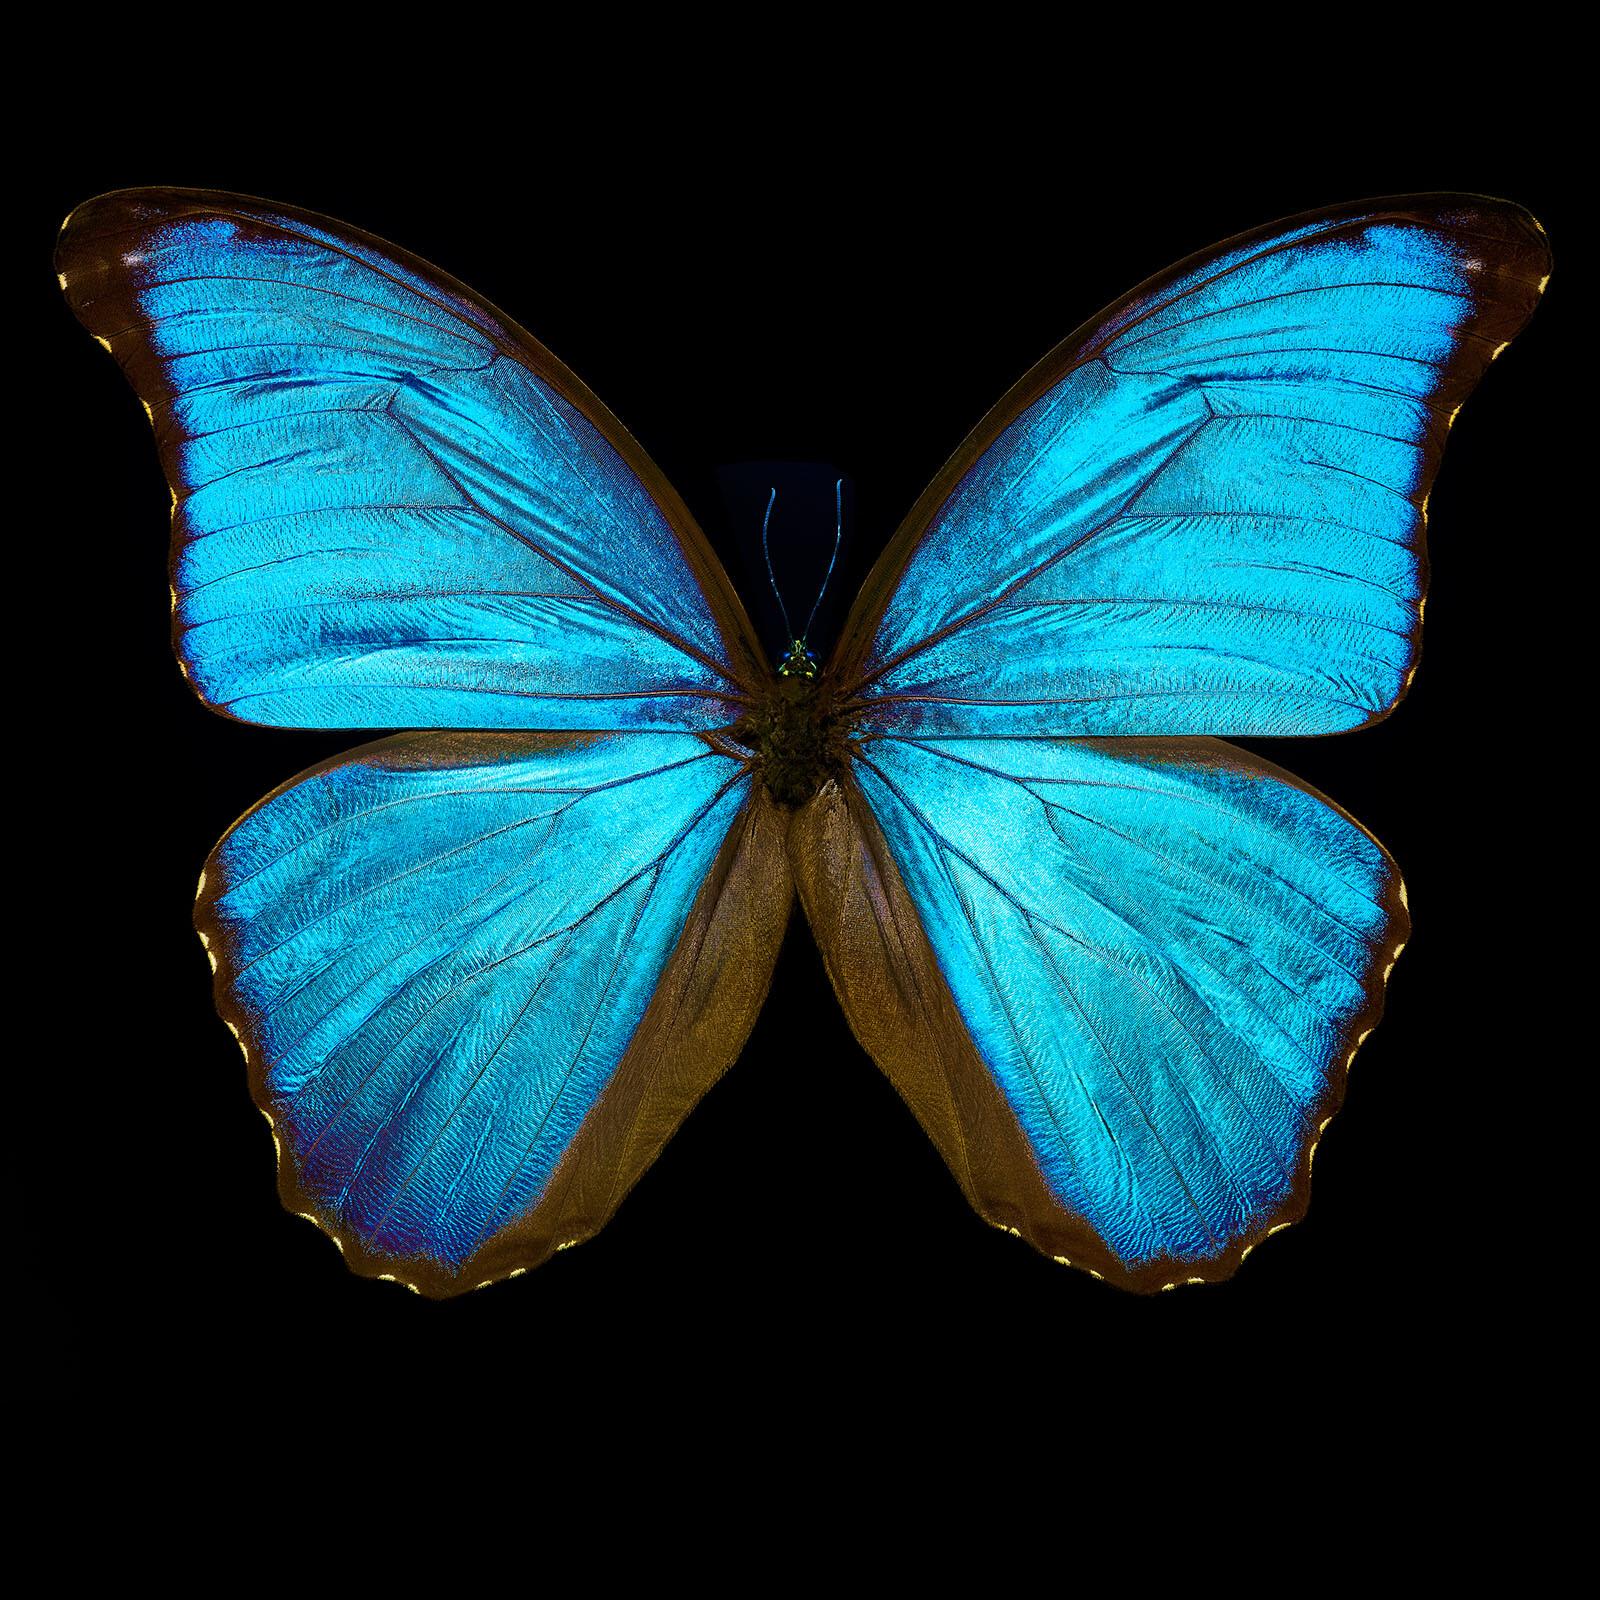 Butterfly III - Heiko Hellwig